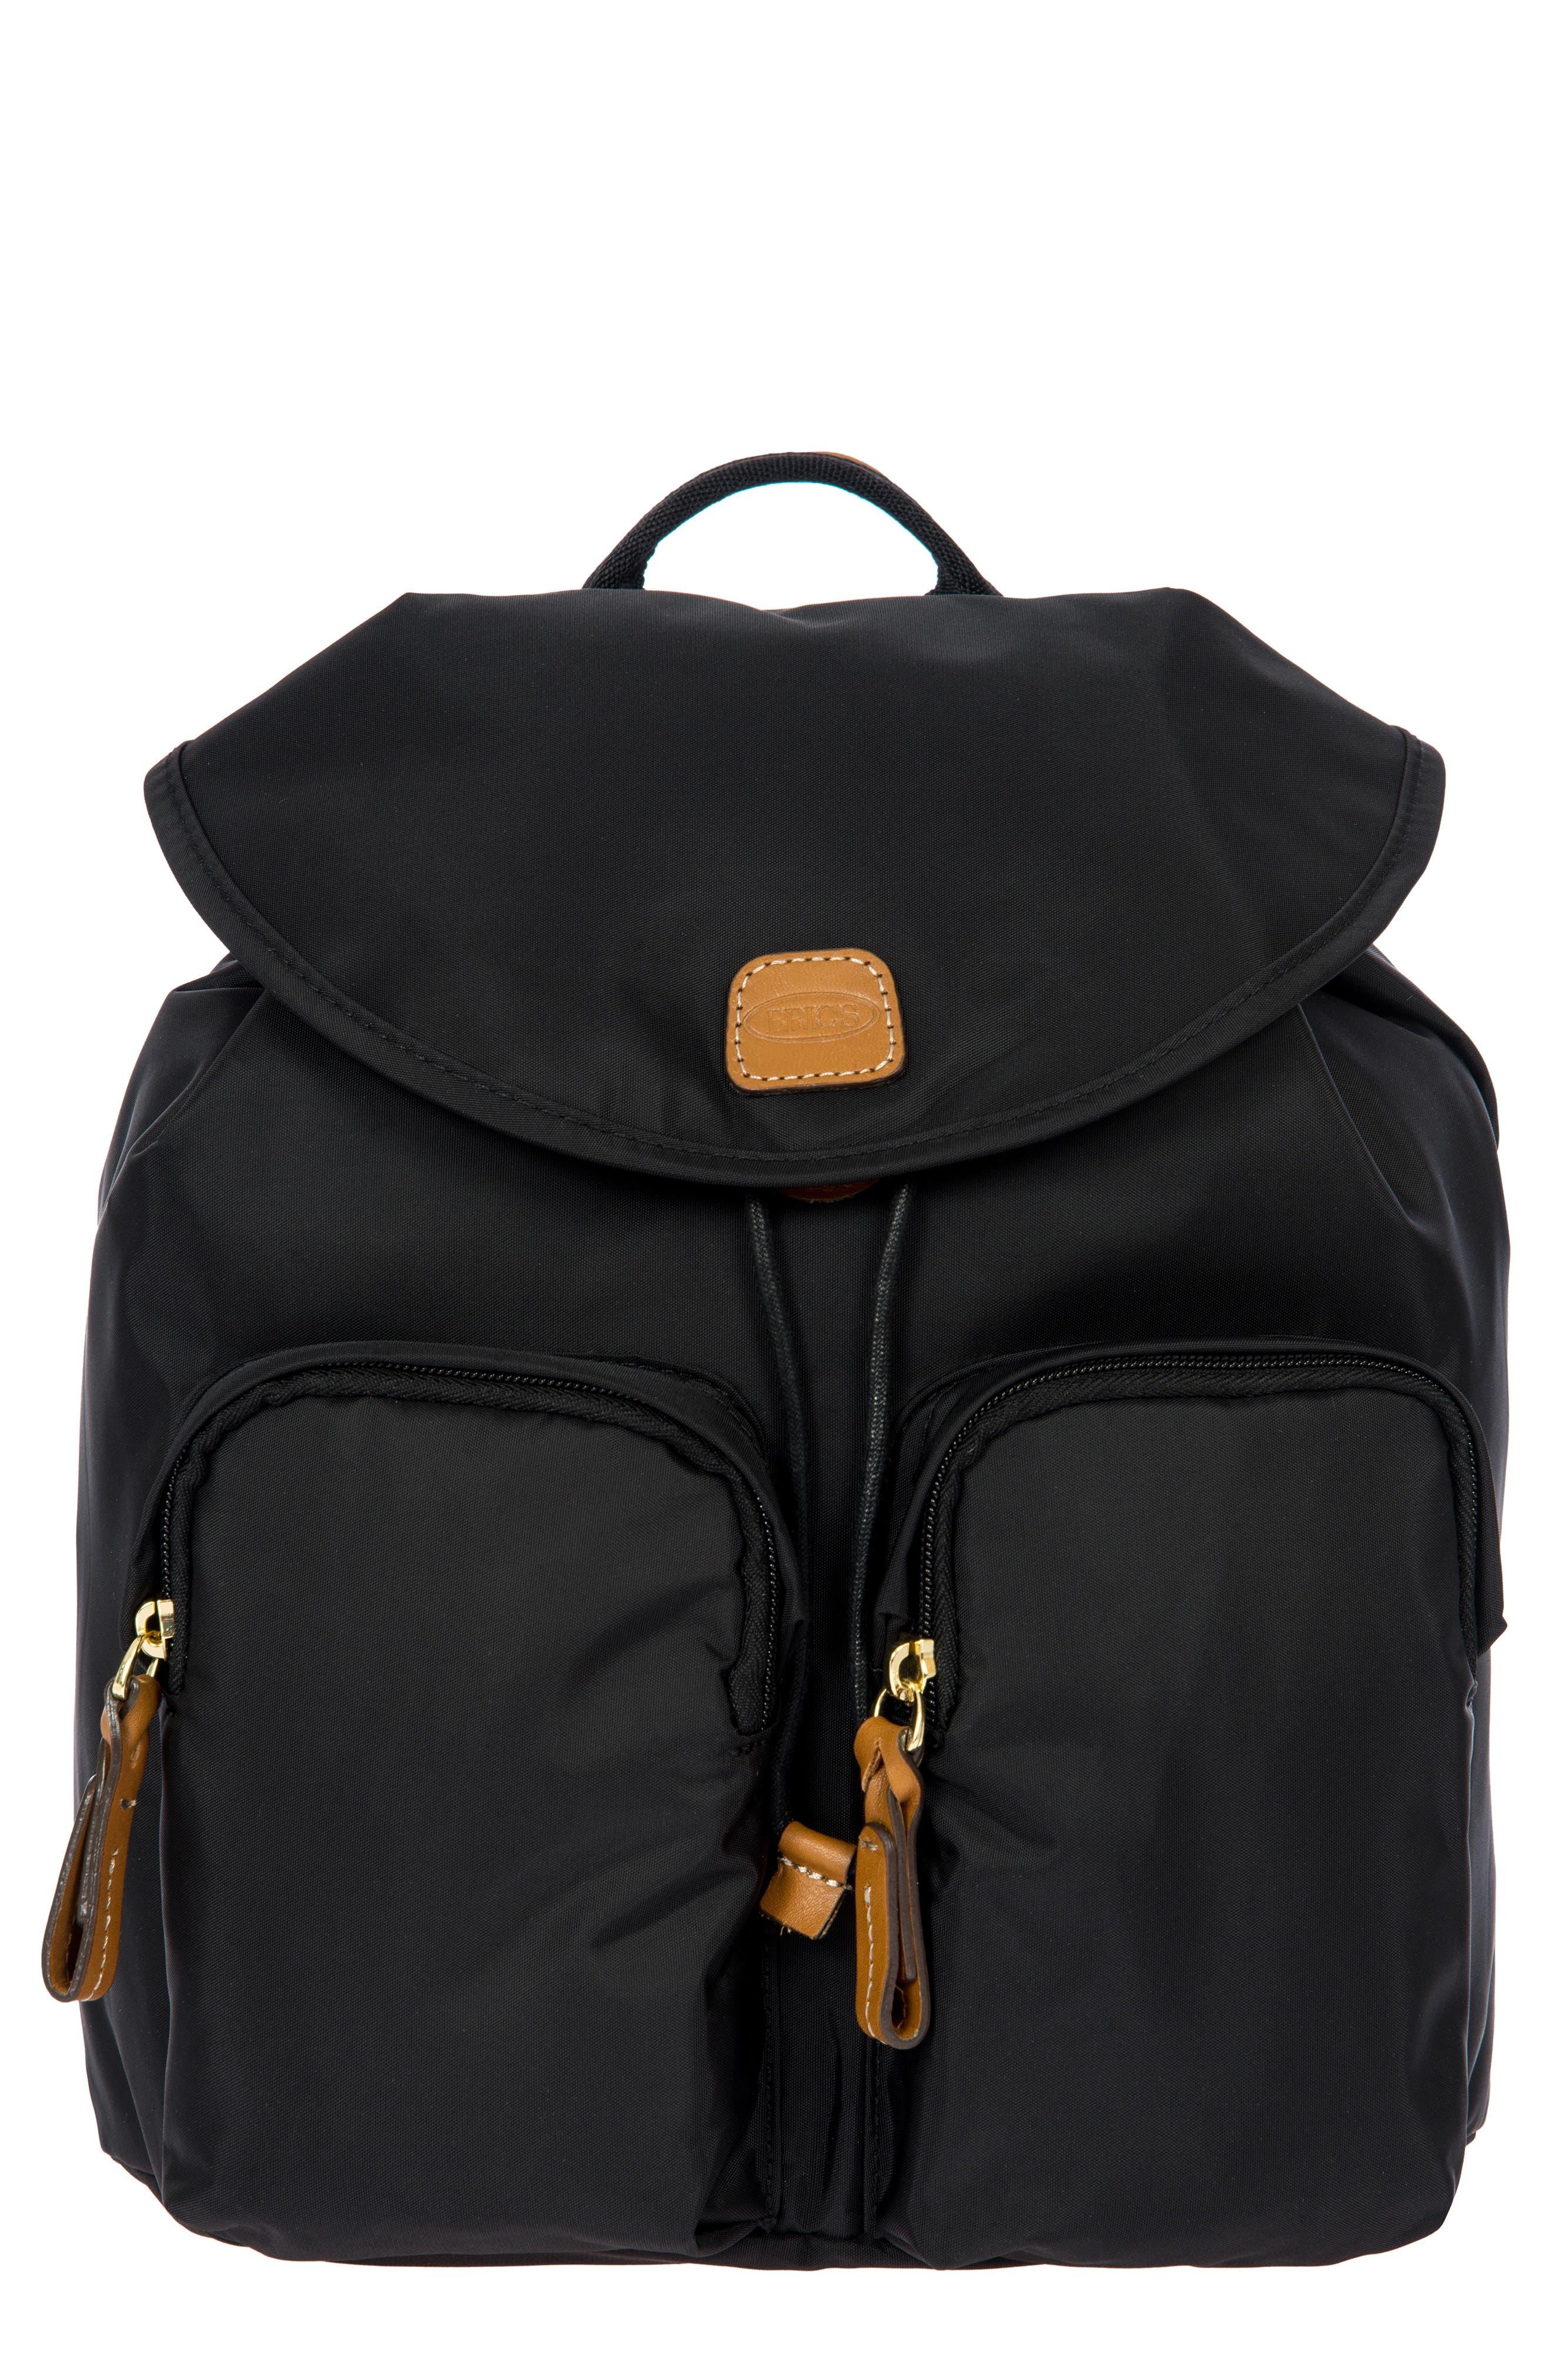 X-Travel City Backpack - Black